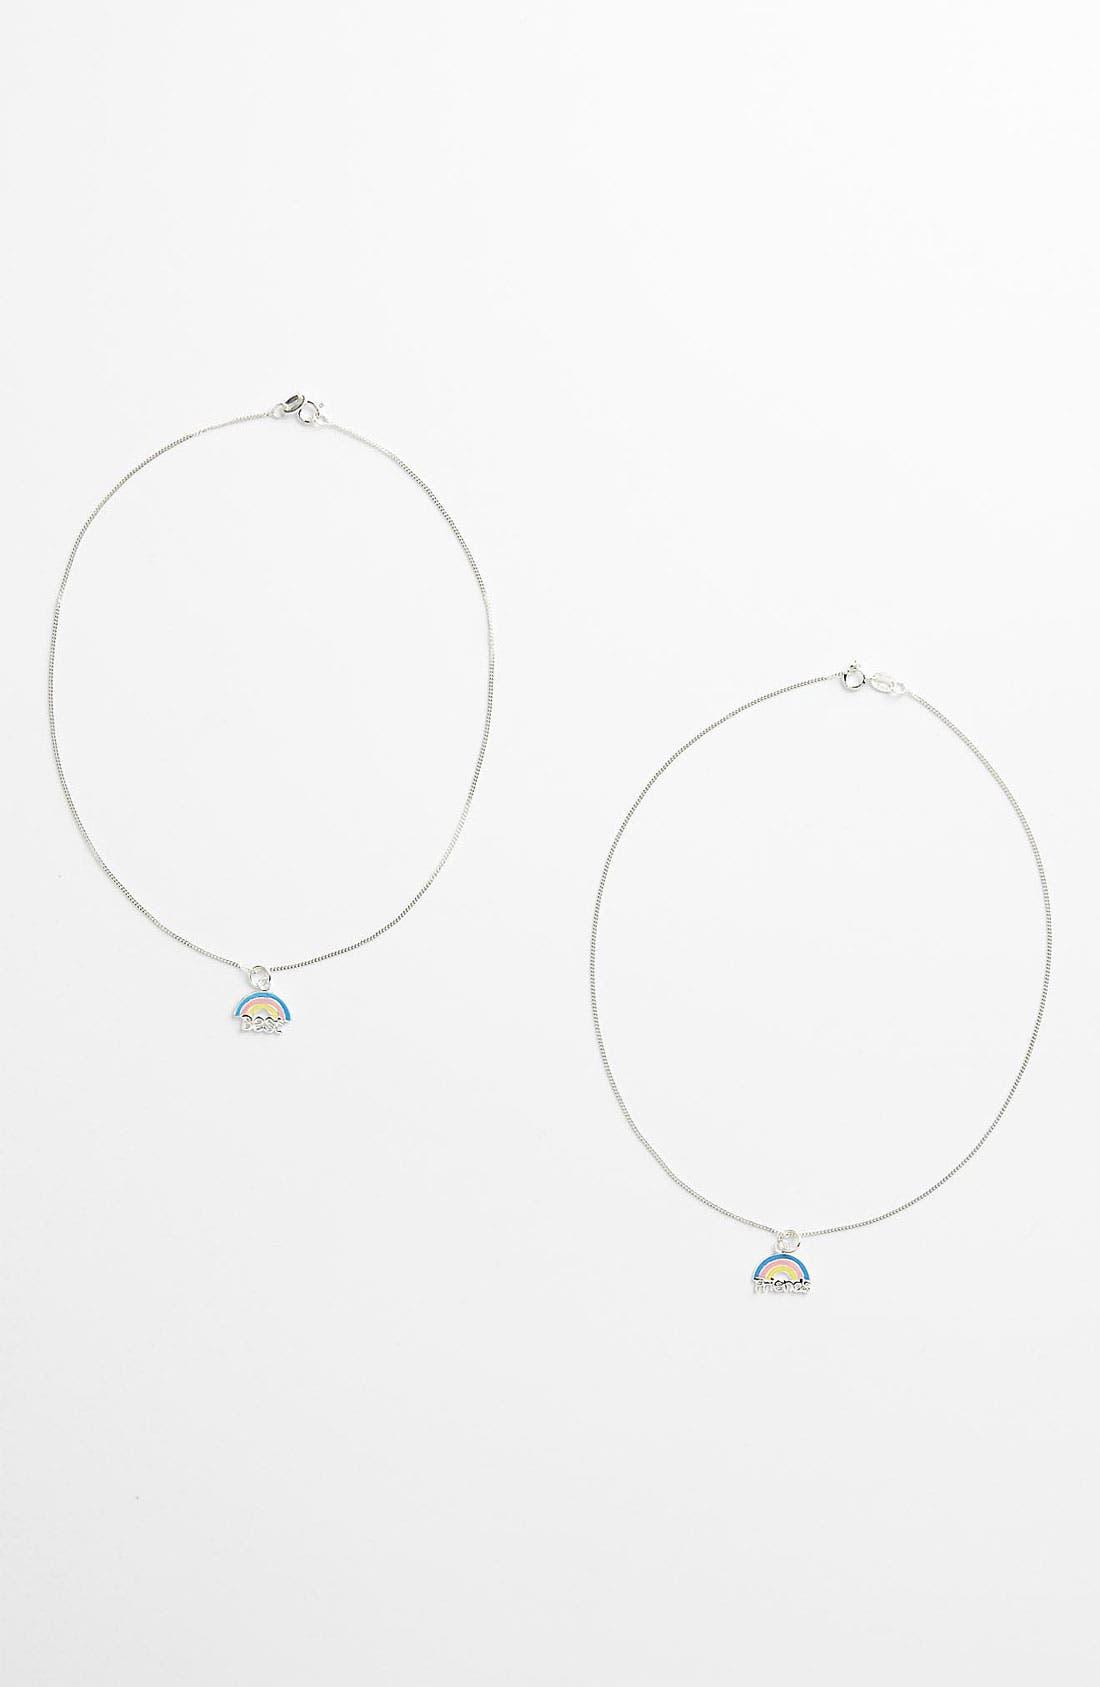 Alternate Image 1 Selected - Tomas 'Rainbow' Necklace (Girls)